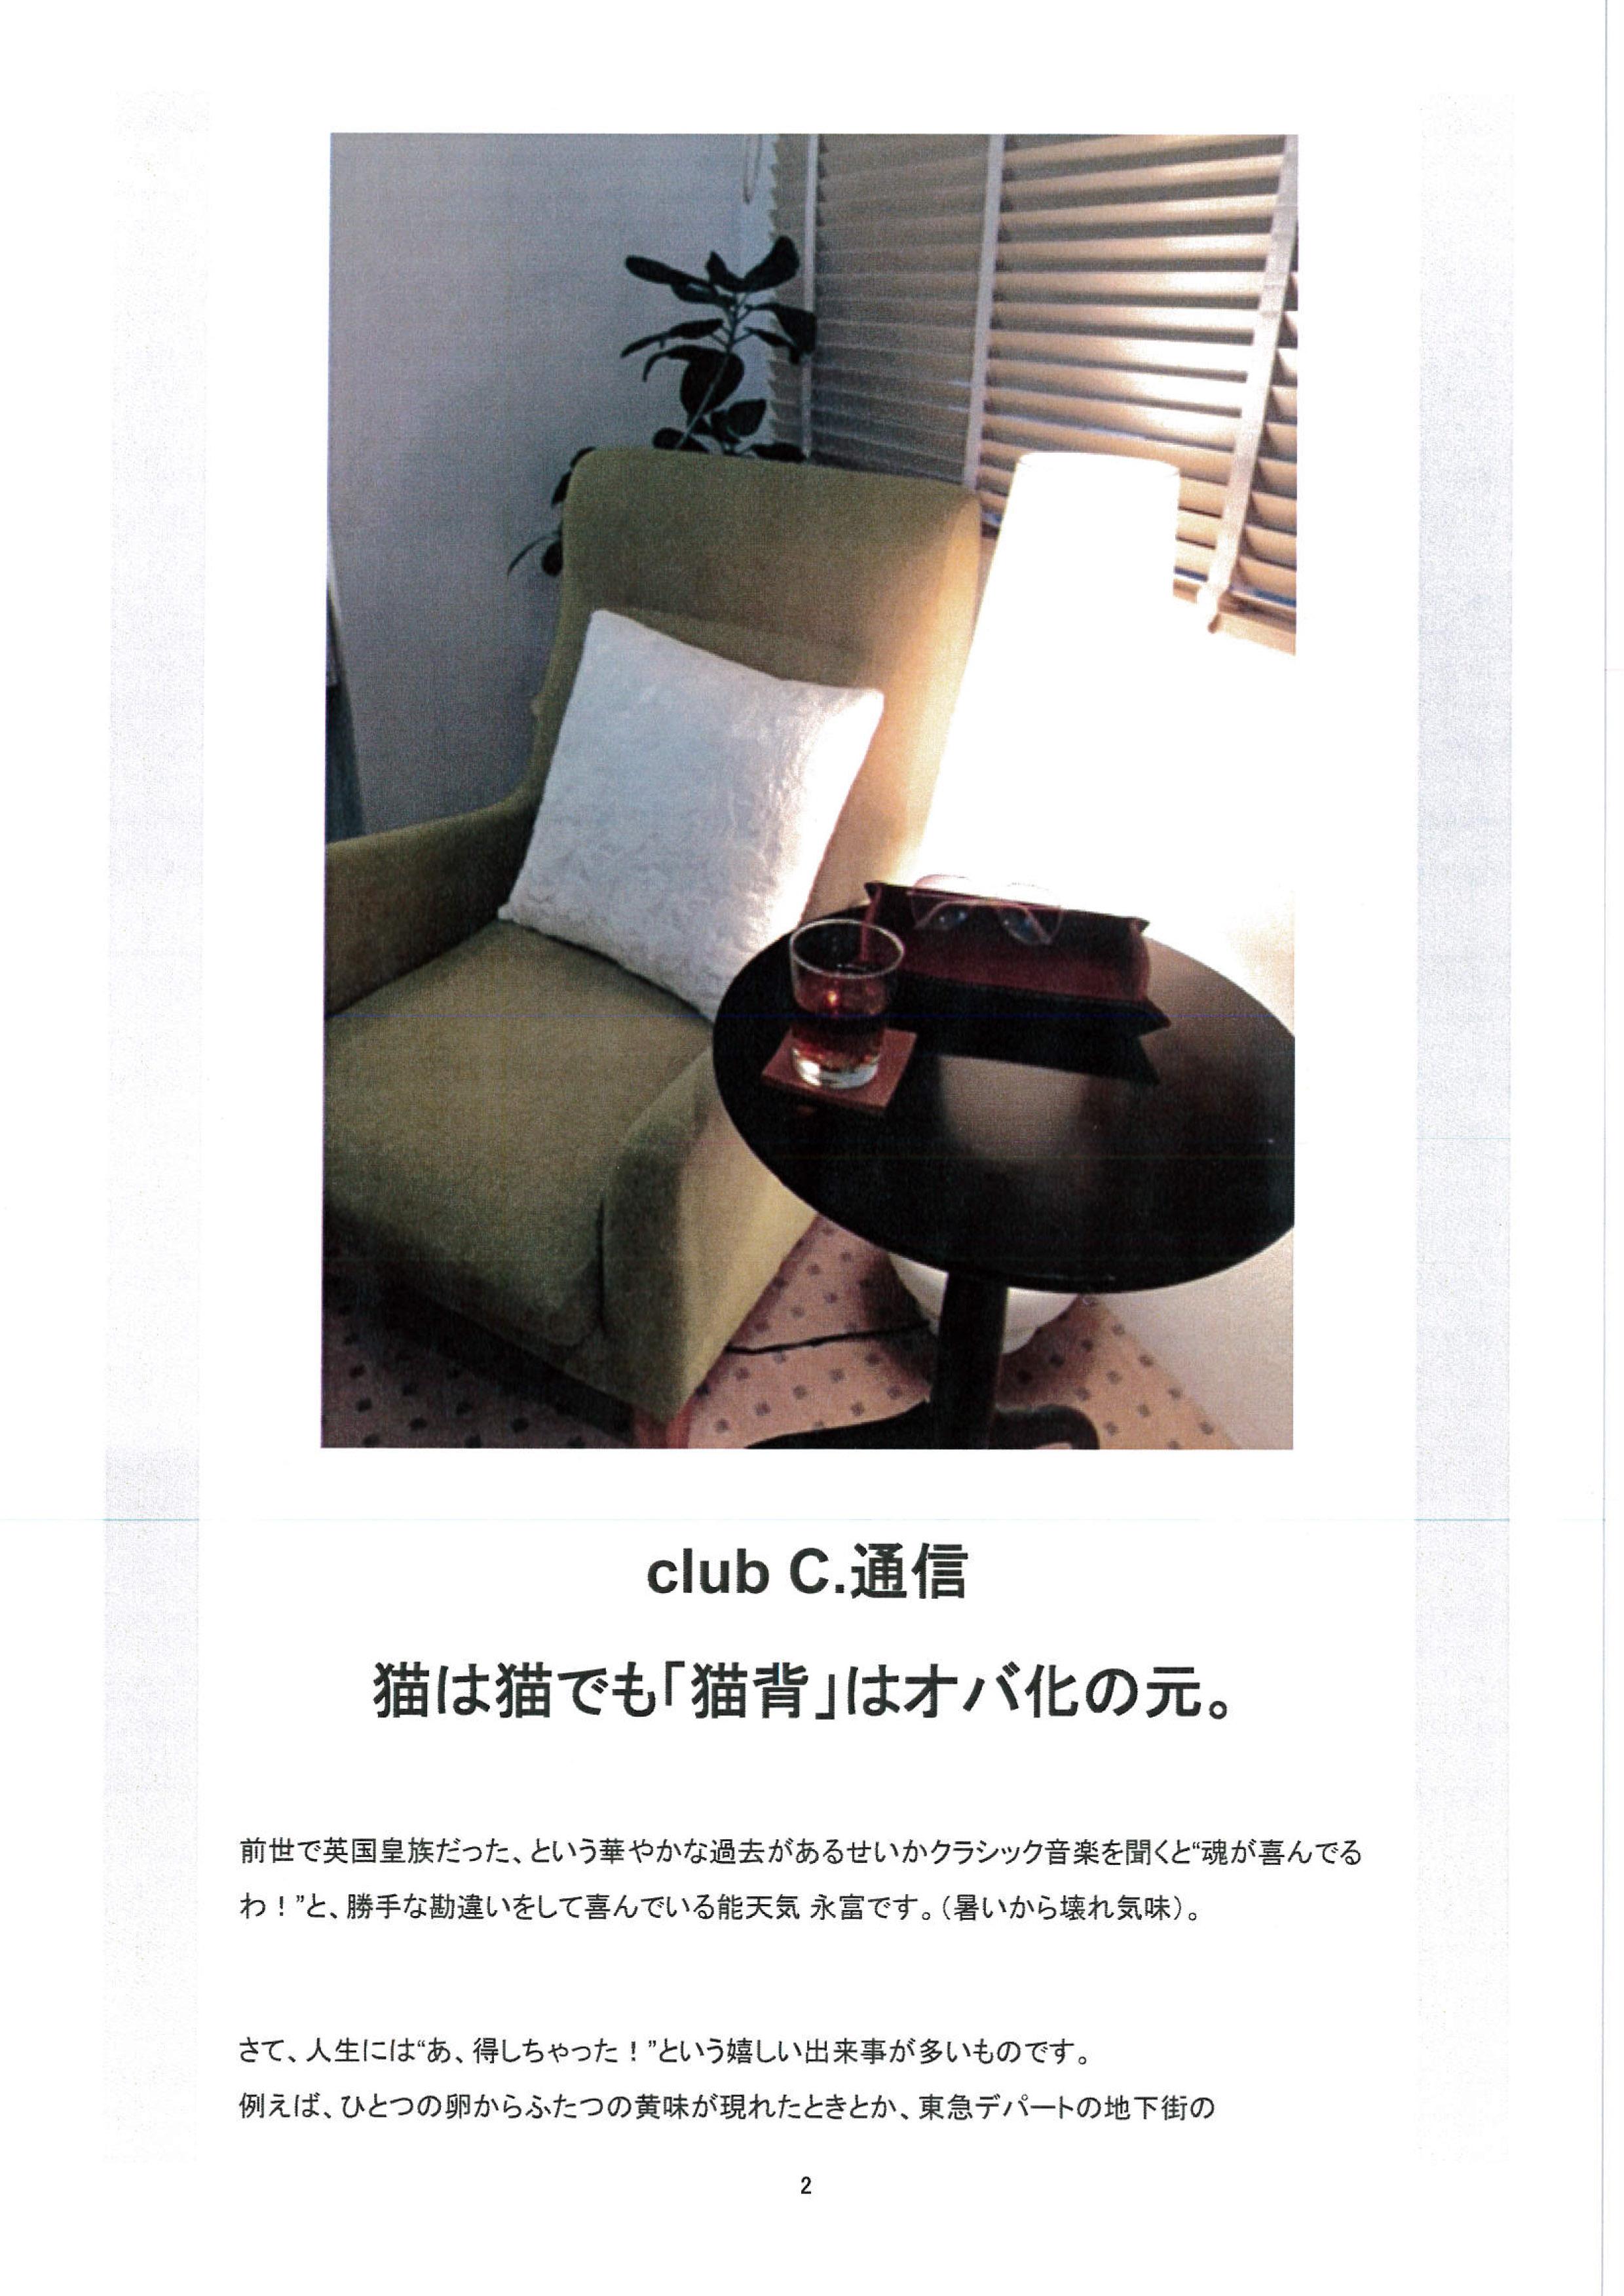 club C 通信 2016.07.07-1